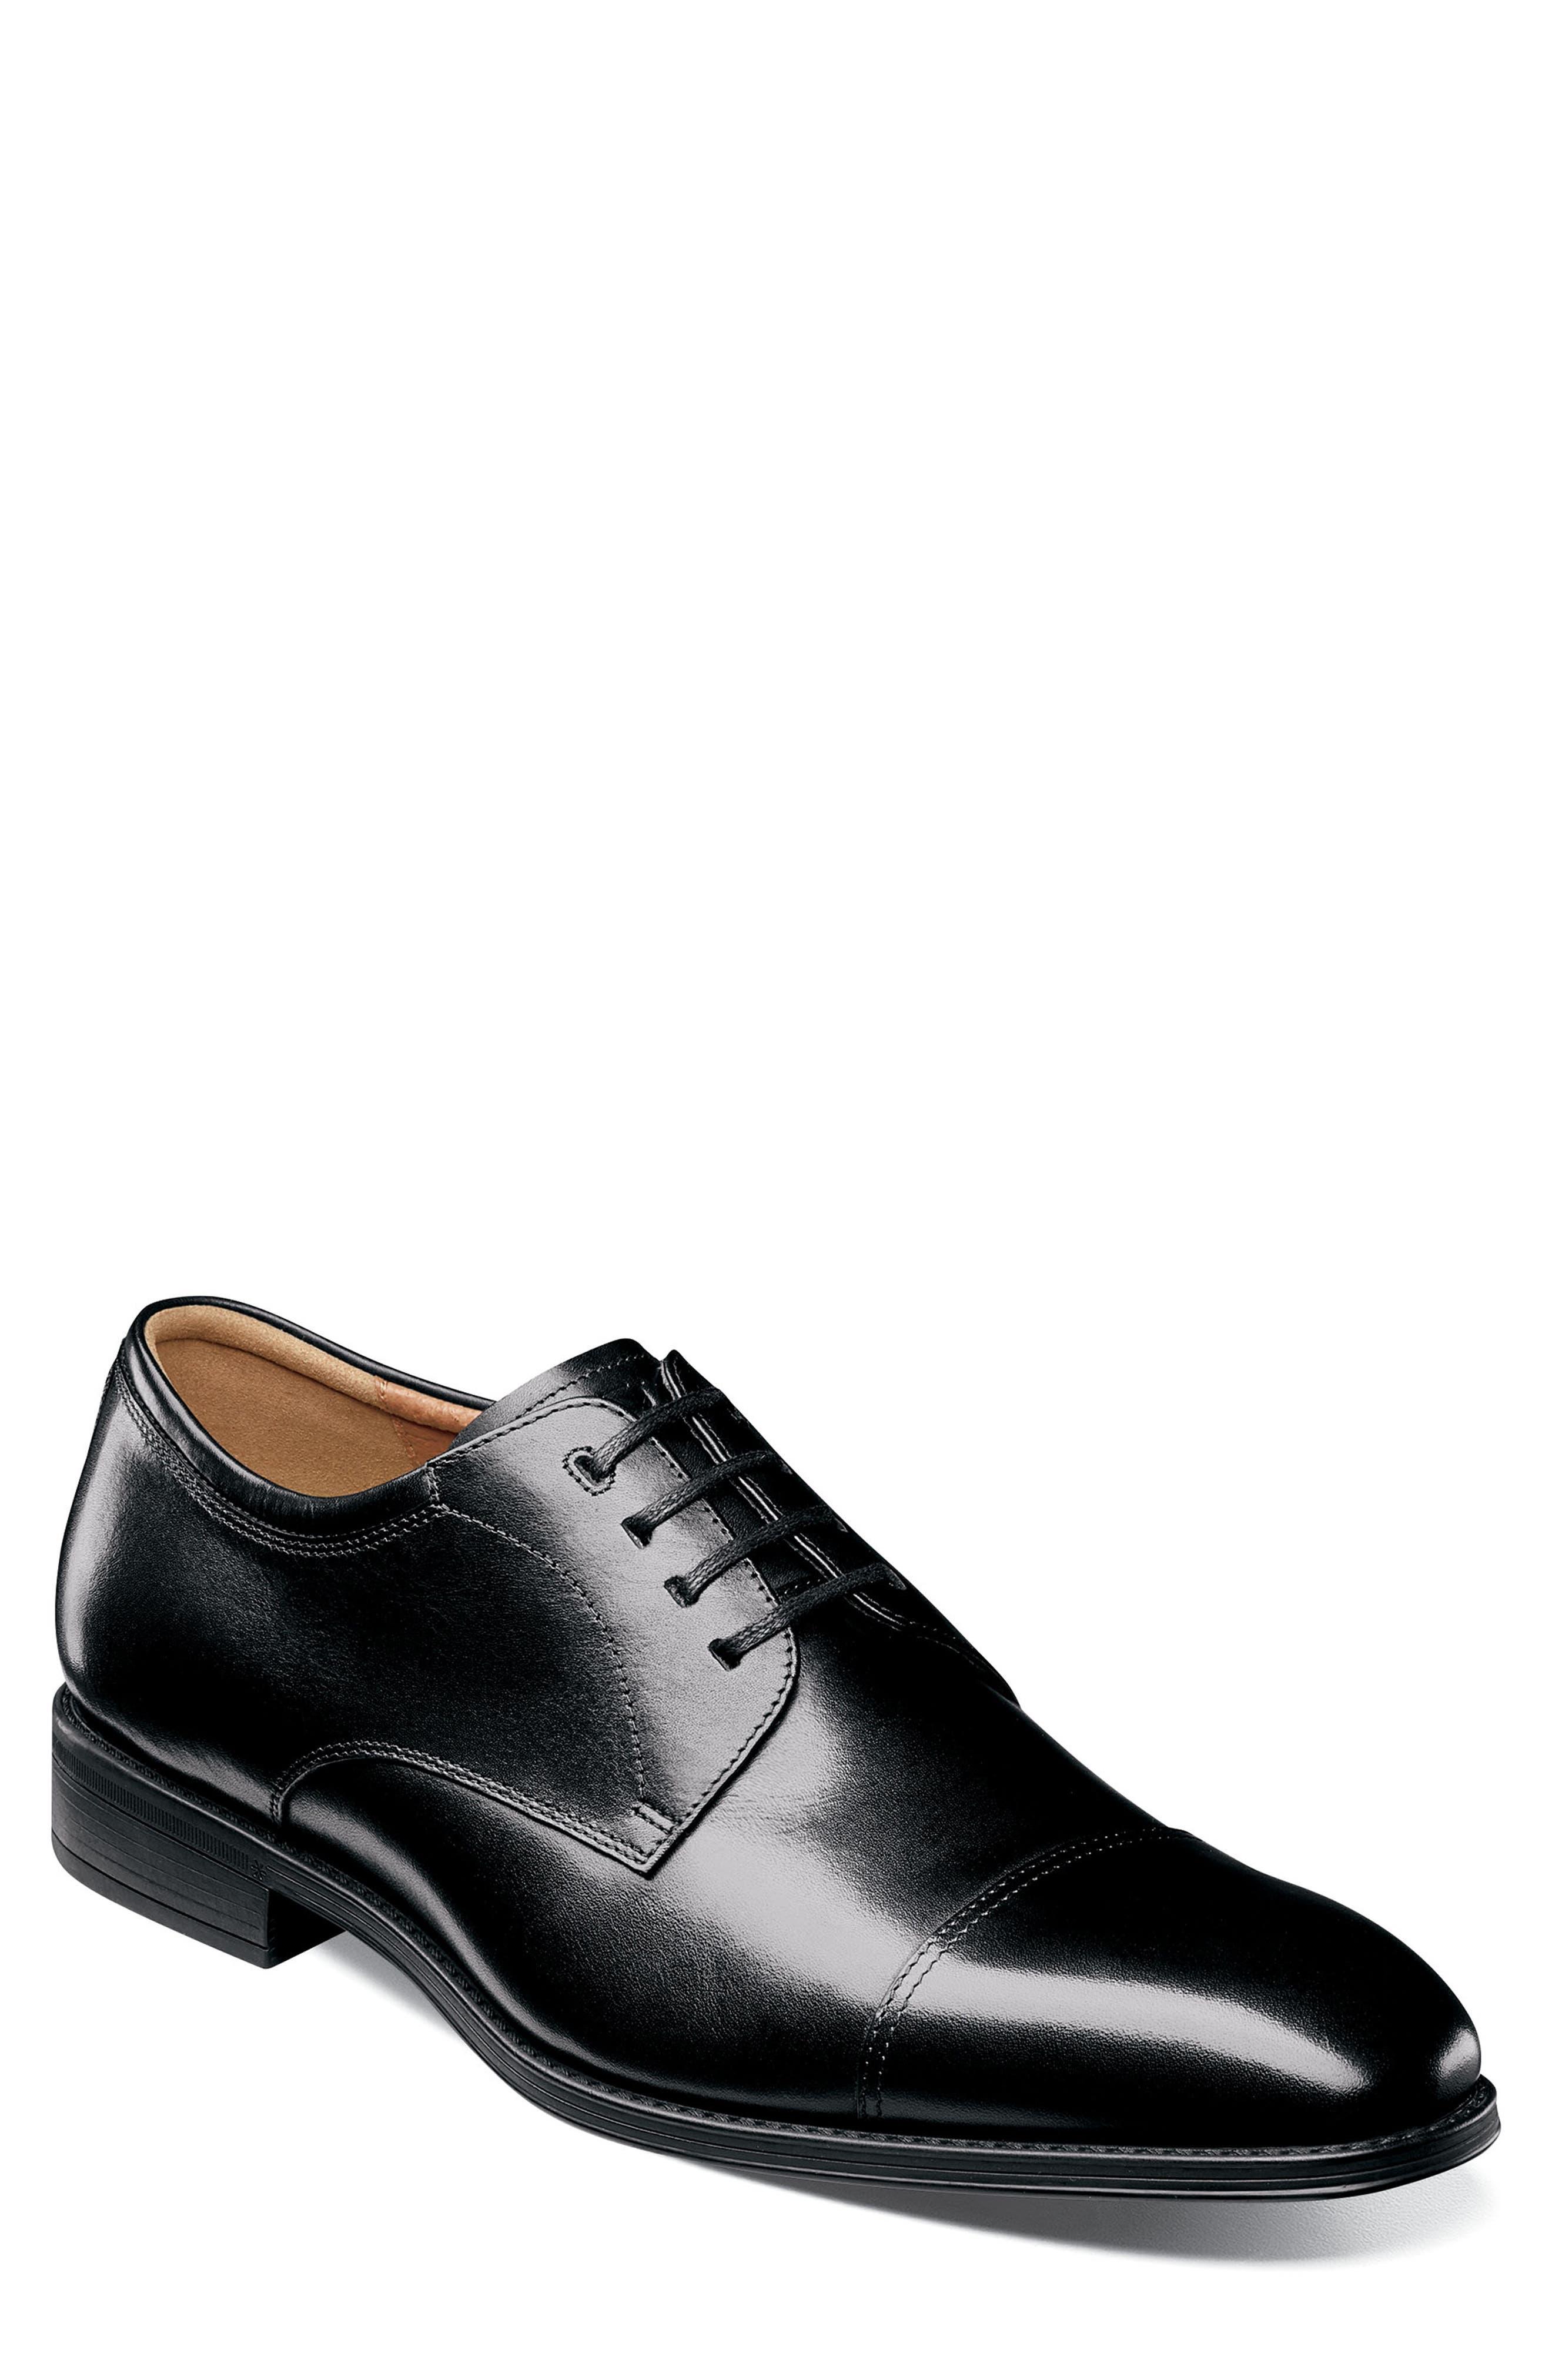 FLORSHEIM Cardineli Cap Toe Derby, Main, color, BLACK LEATHER